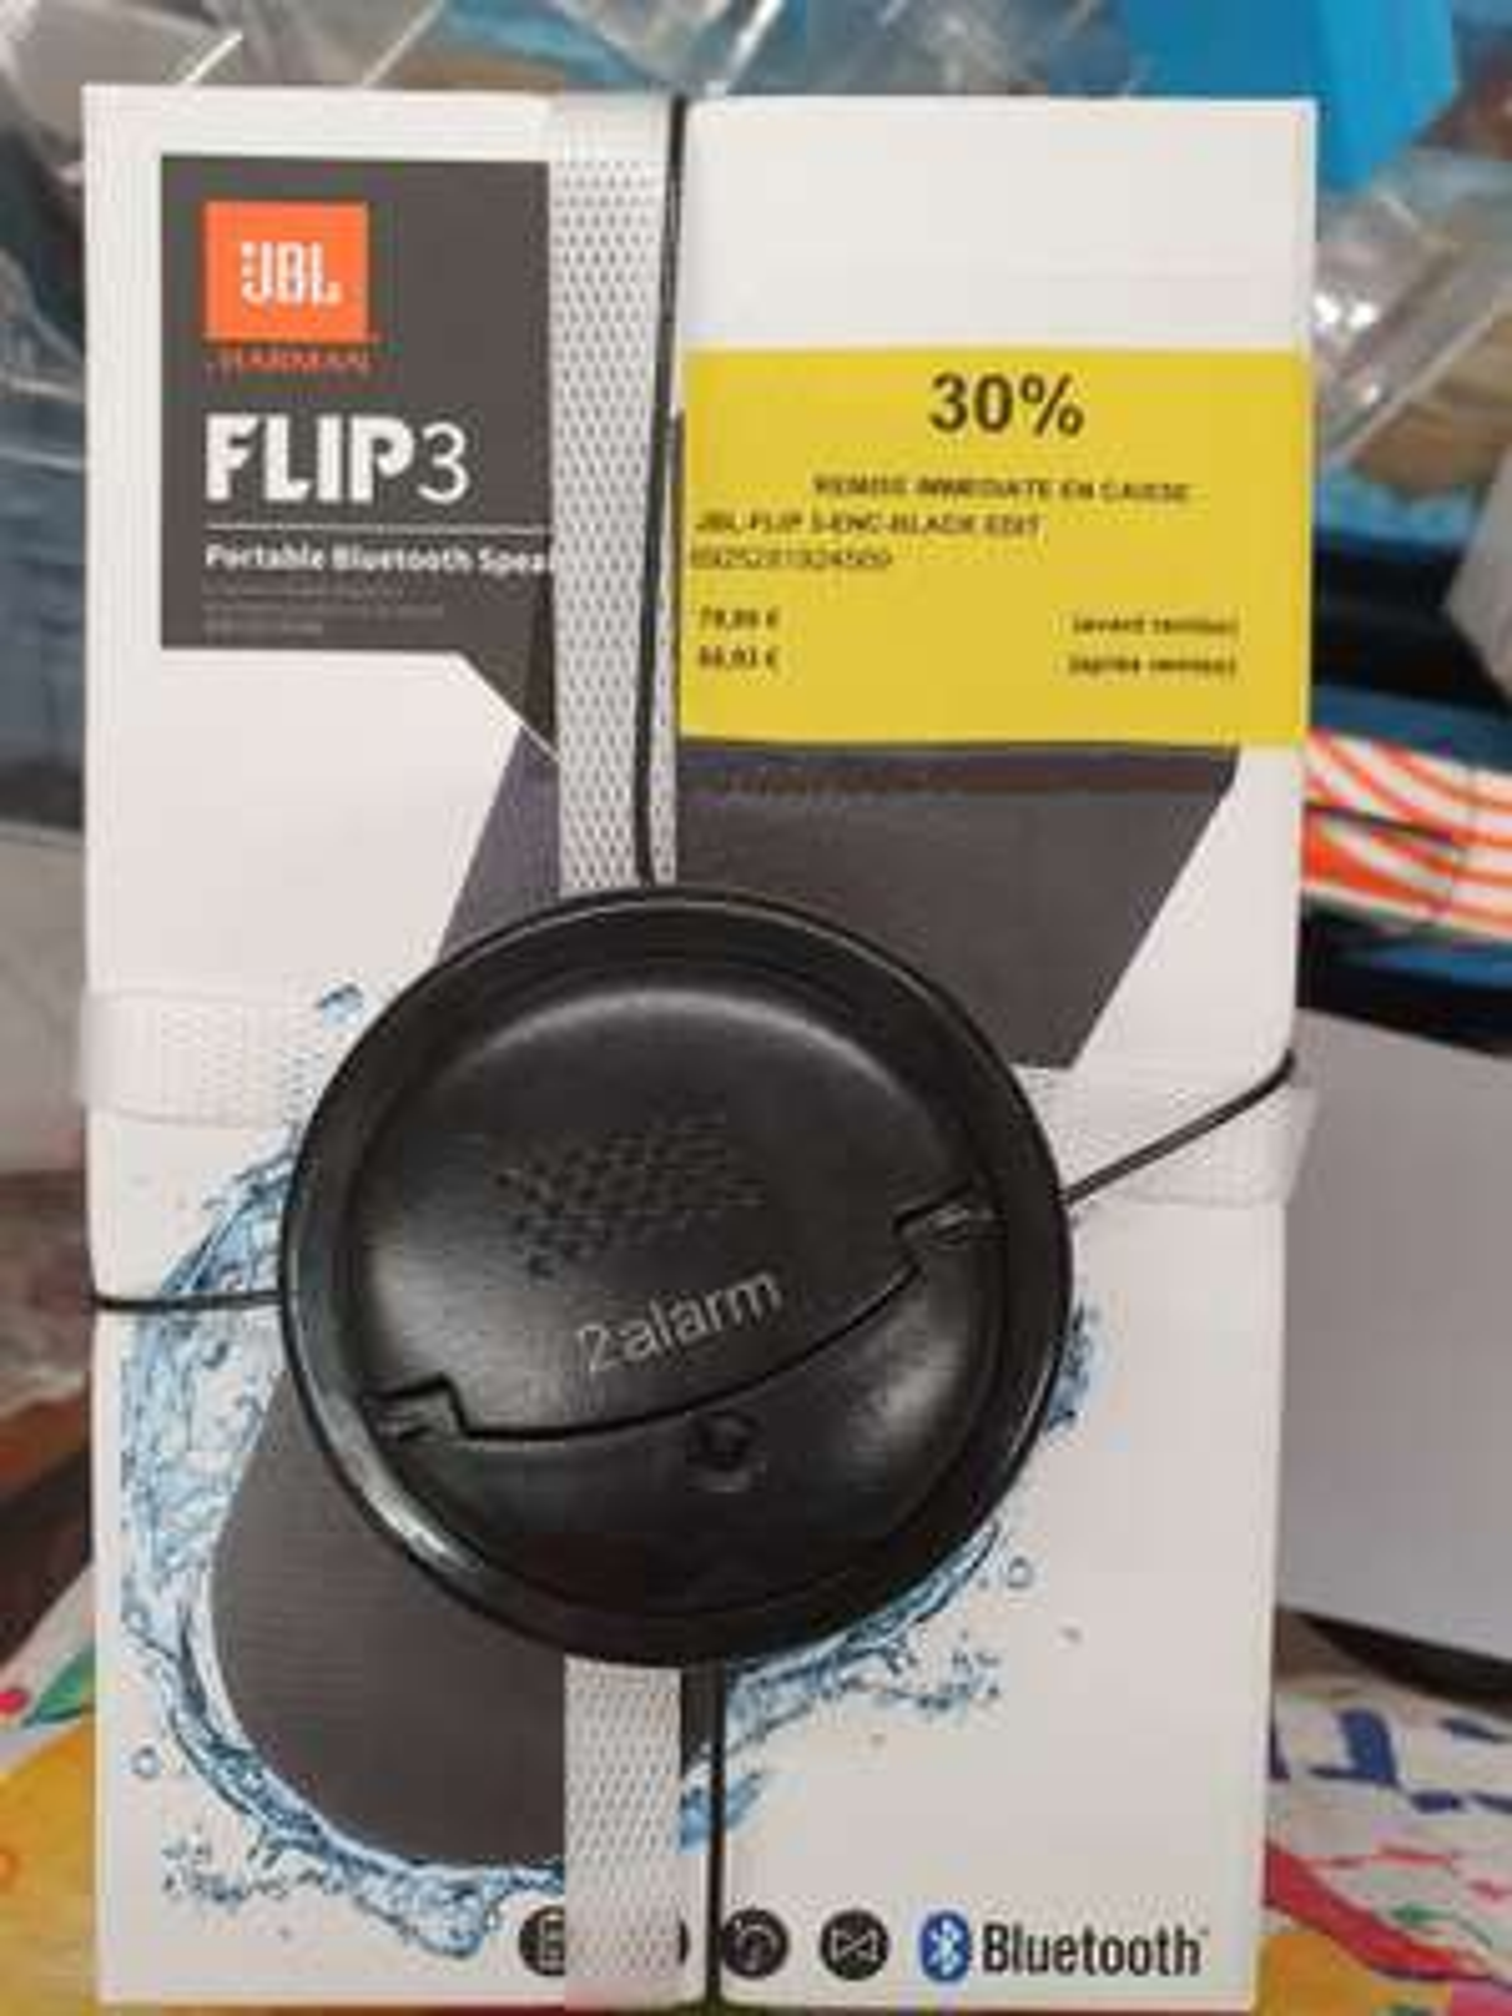 Enceinte Bluetooth JBL Flip 3 Flip 3 Édition Stealth Noir - Sannois (95)